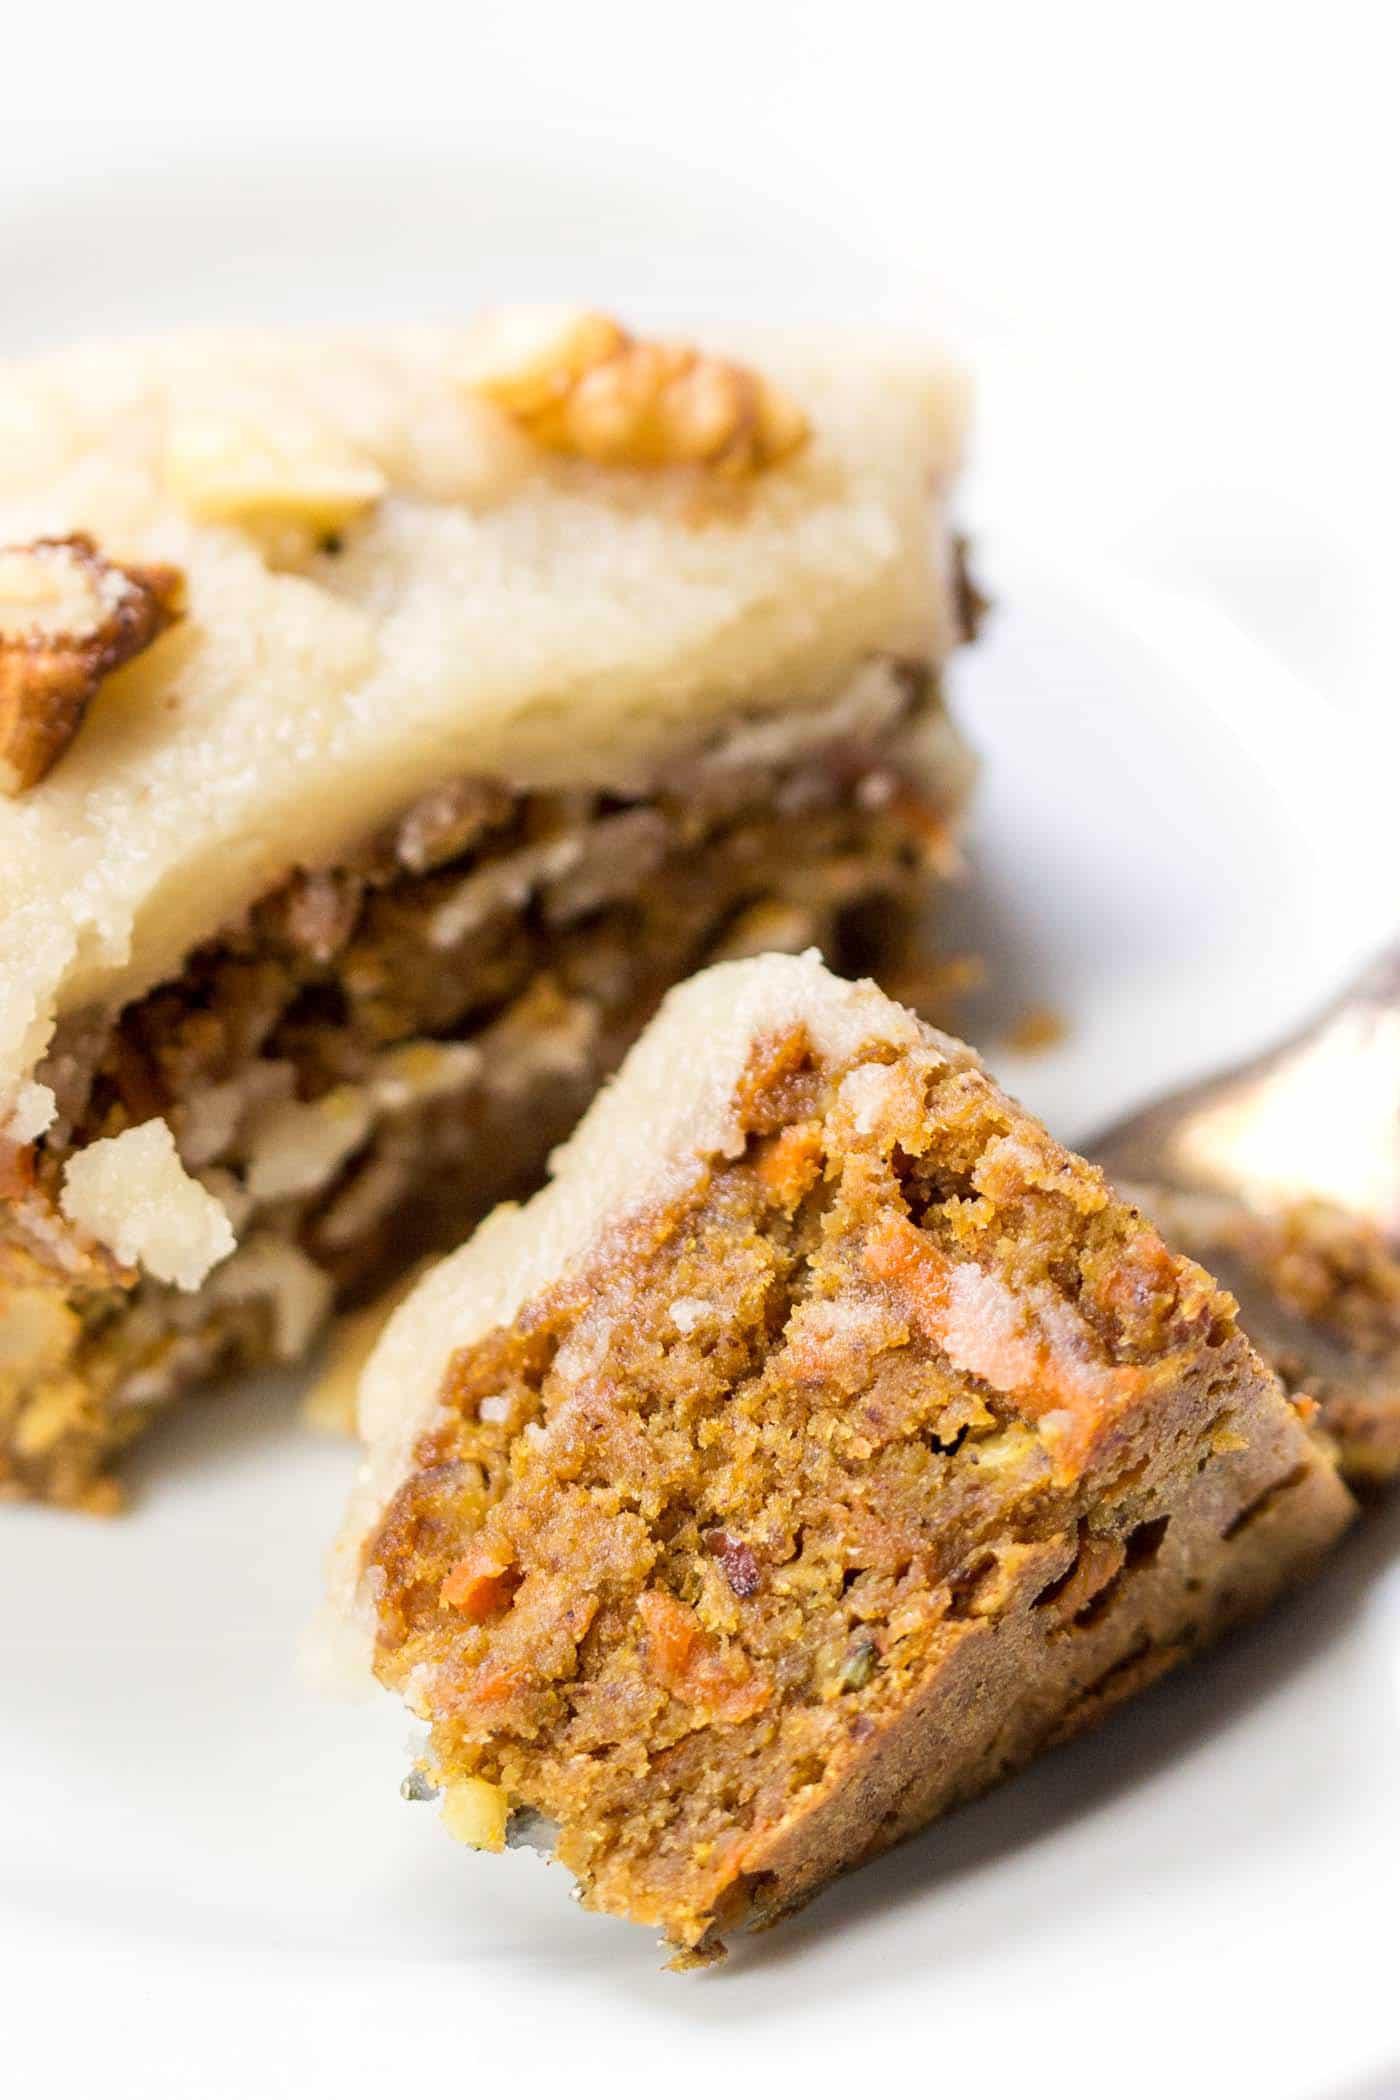 Healthy Vegan Carrot Cake  Vegan Carrot Cake Quinoa Breakfast Bars Simply Quinoa